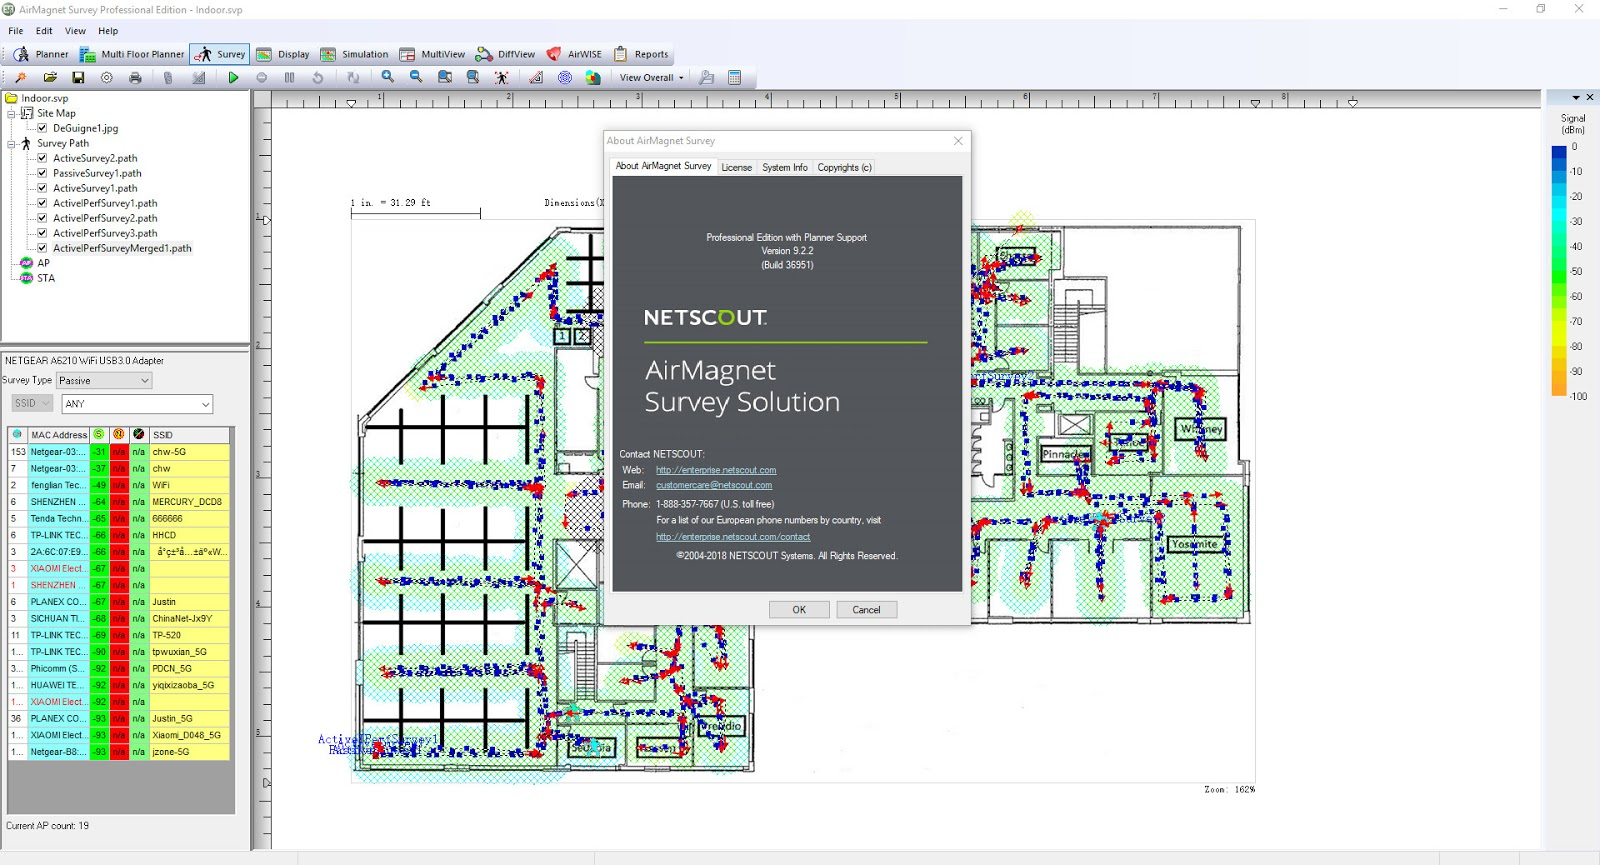 ekahau site survey documentation